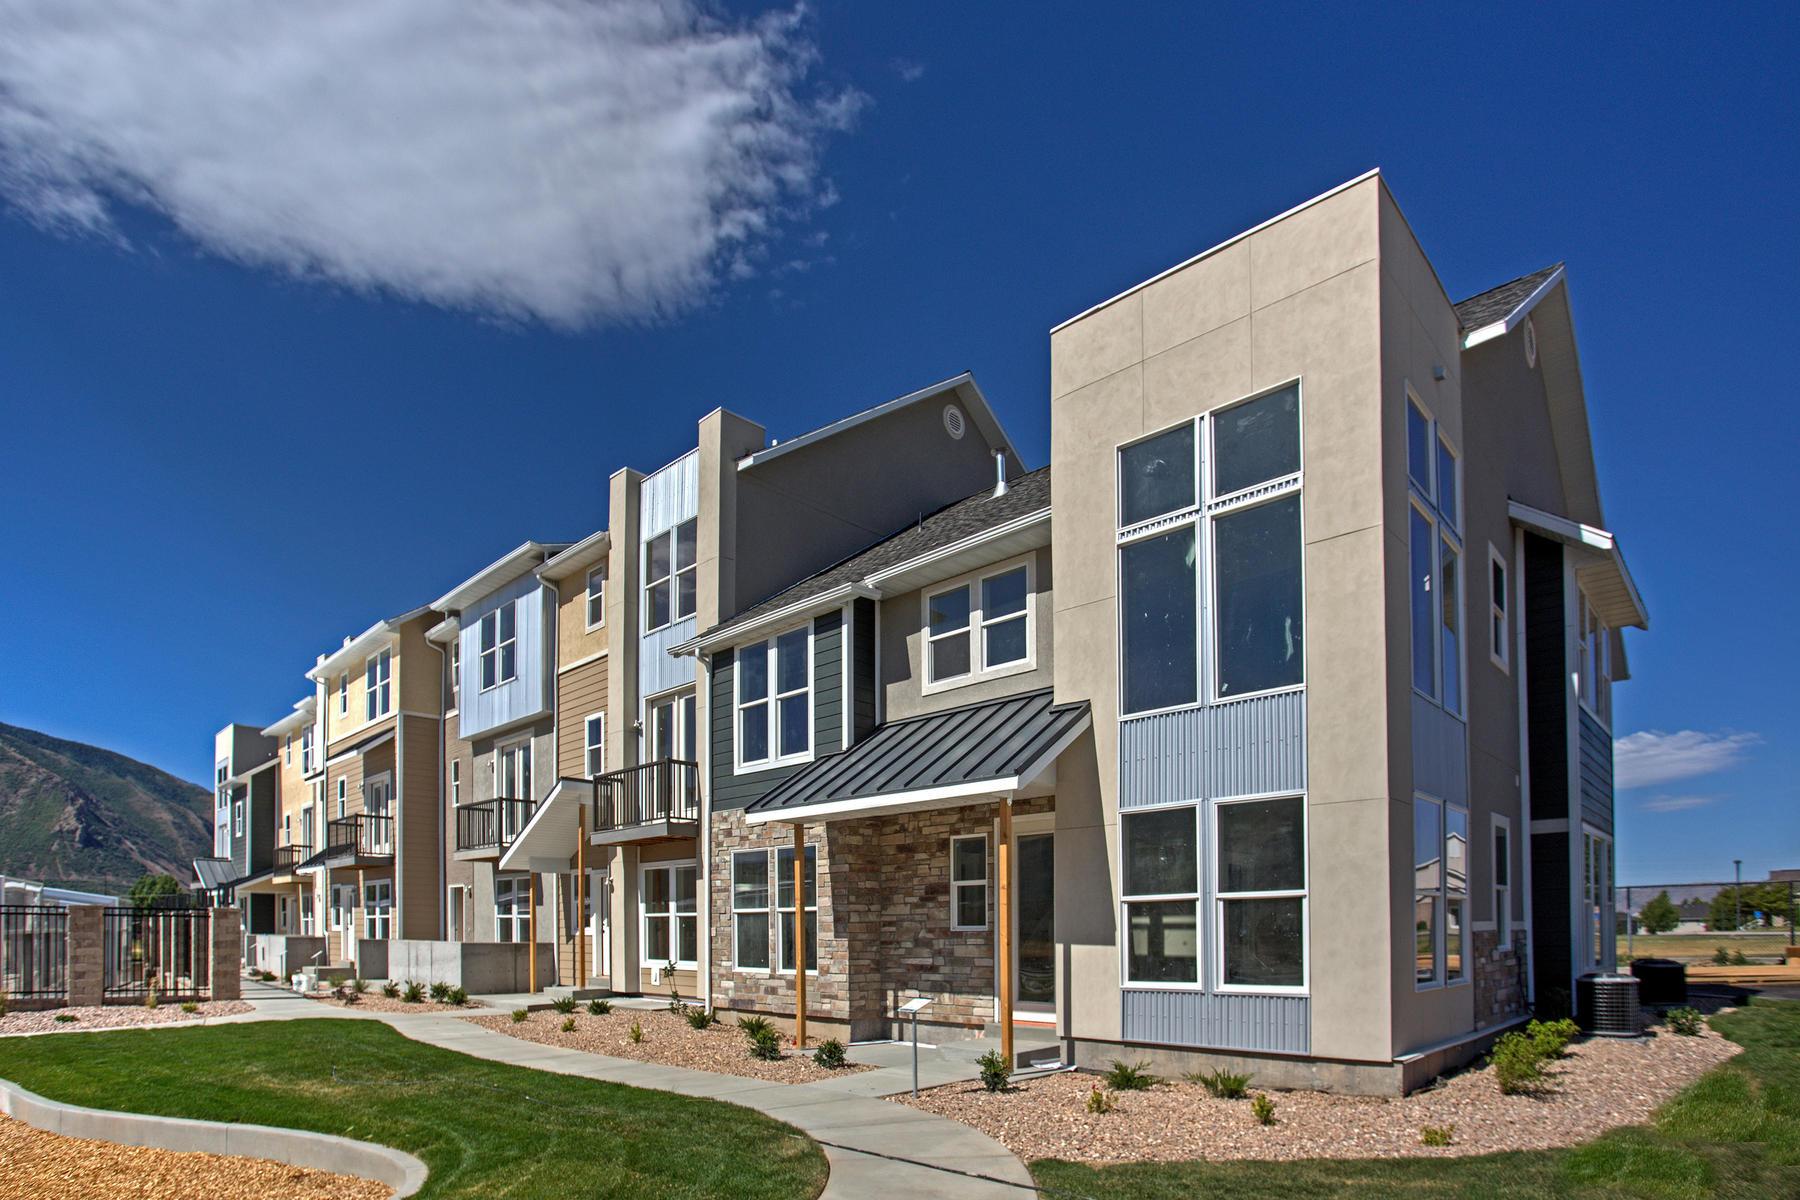 Maison en rangée pour l Vente à 4 Bedroom Hampton Floorplan in The Ridge at Spanish Fork 2574 E High Ridge Rd Spanish Fork, Utah, 84660 États-Unis